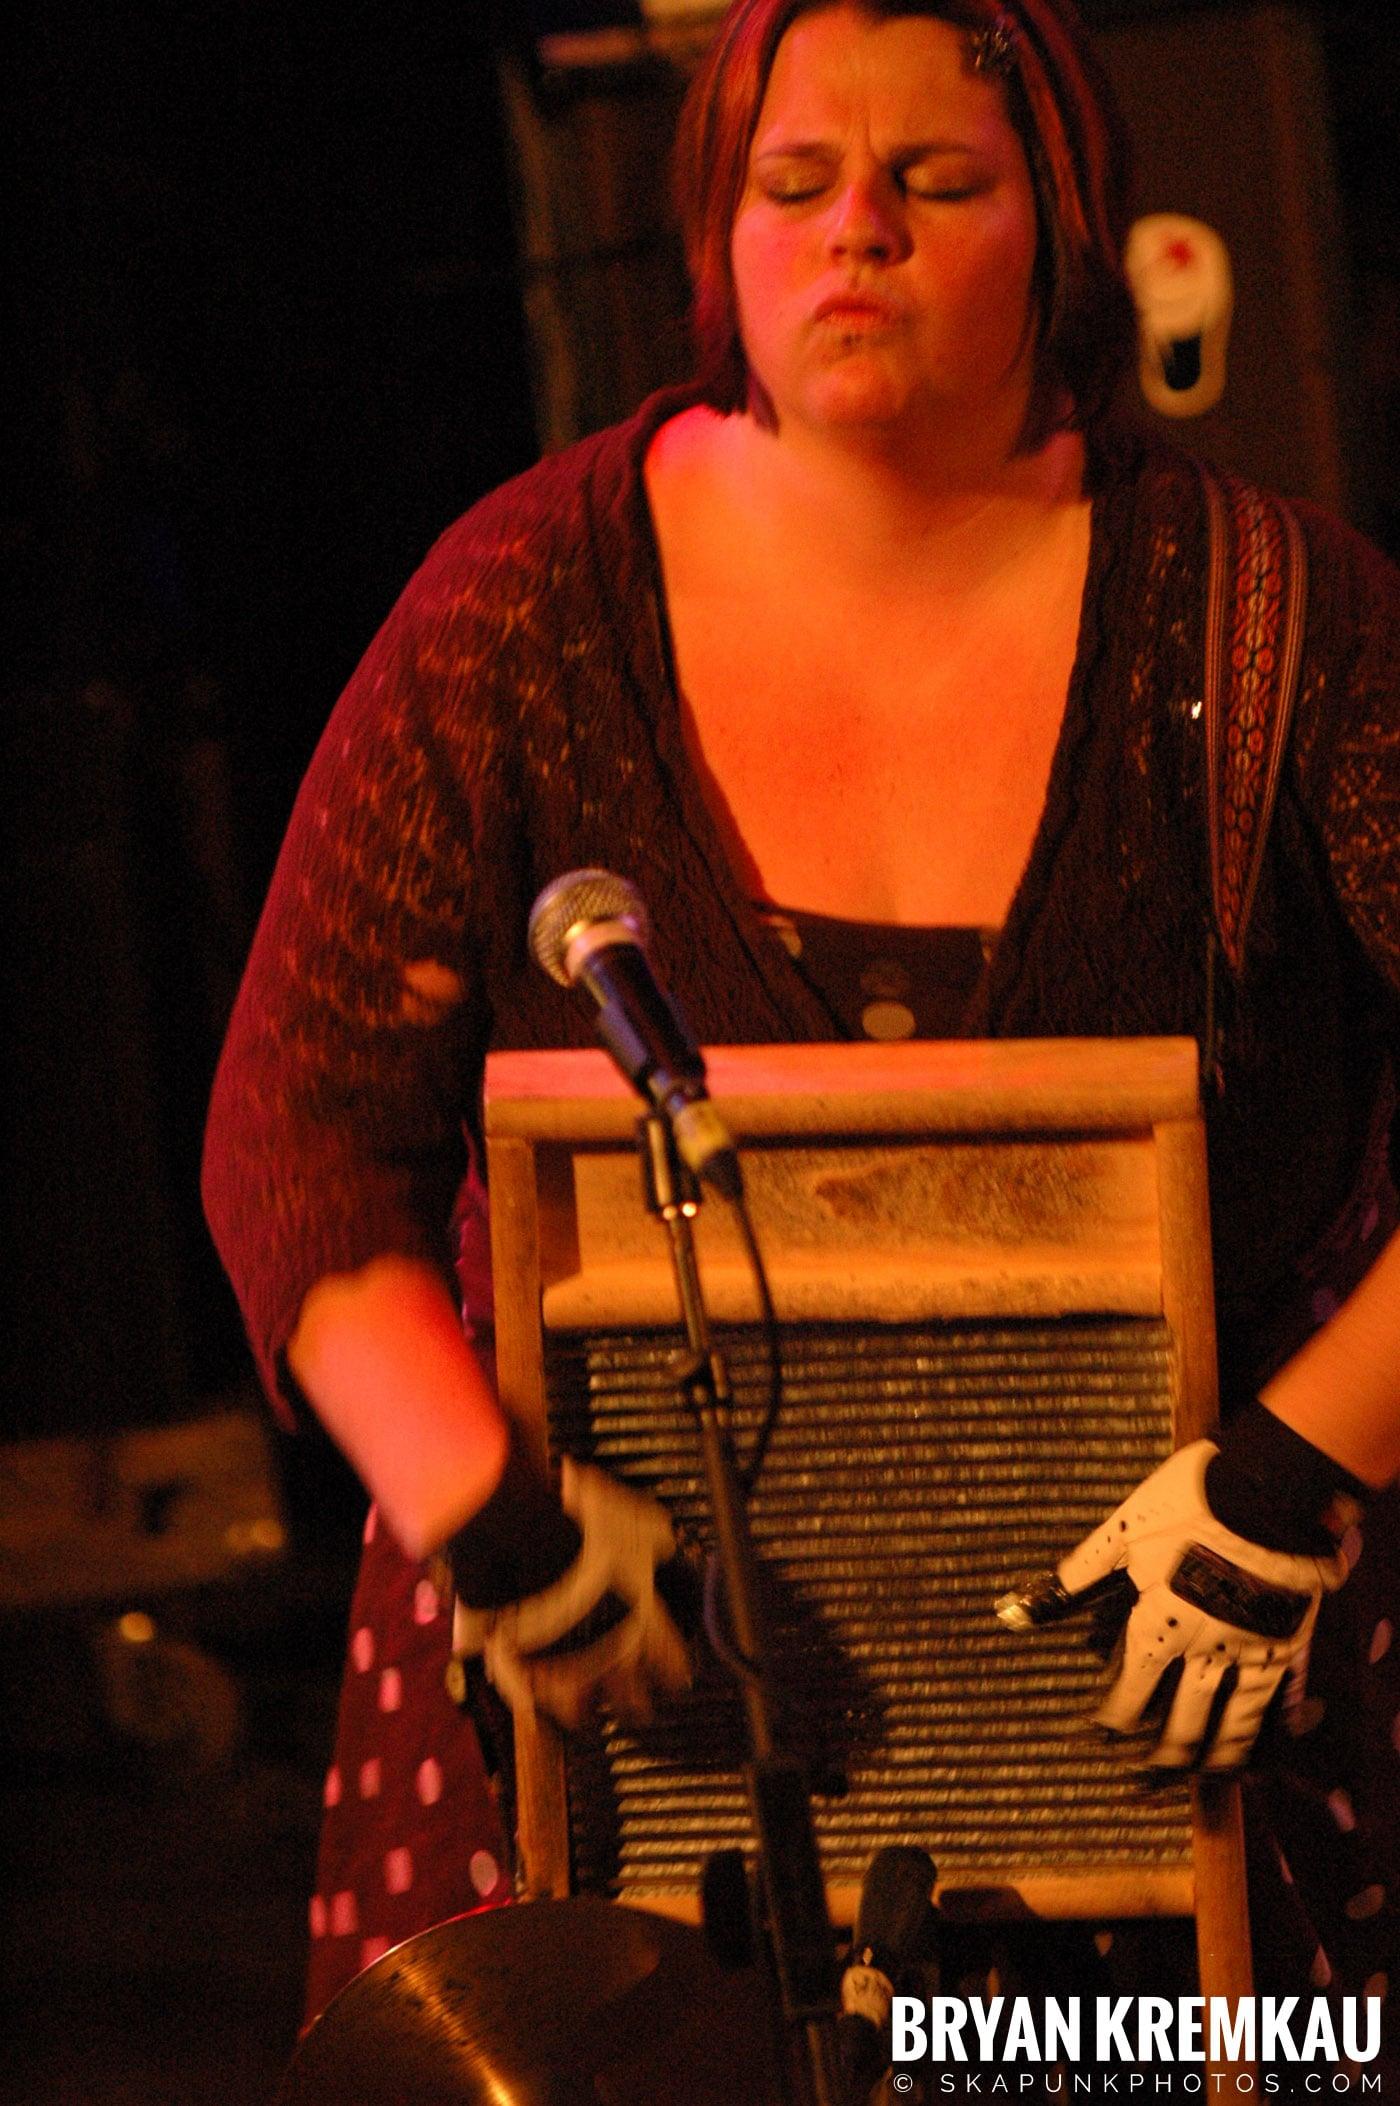 Rev. Peyton's Big Damn Band @ The Chance, Poughkeepsie NY - 2.21.08 (9)